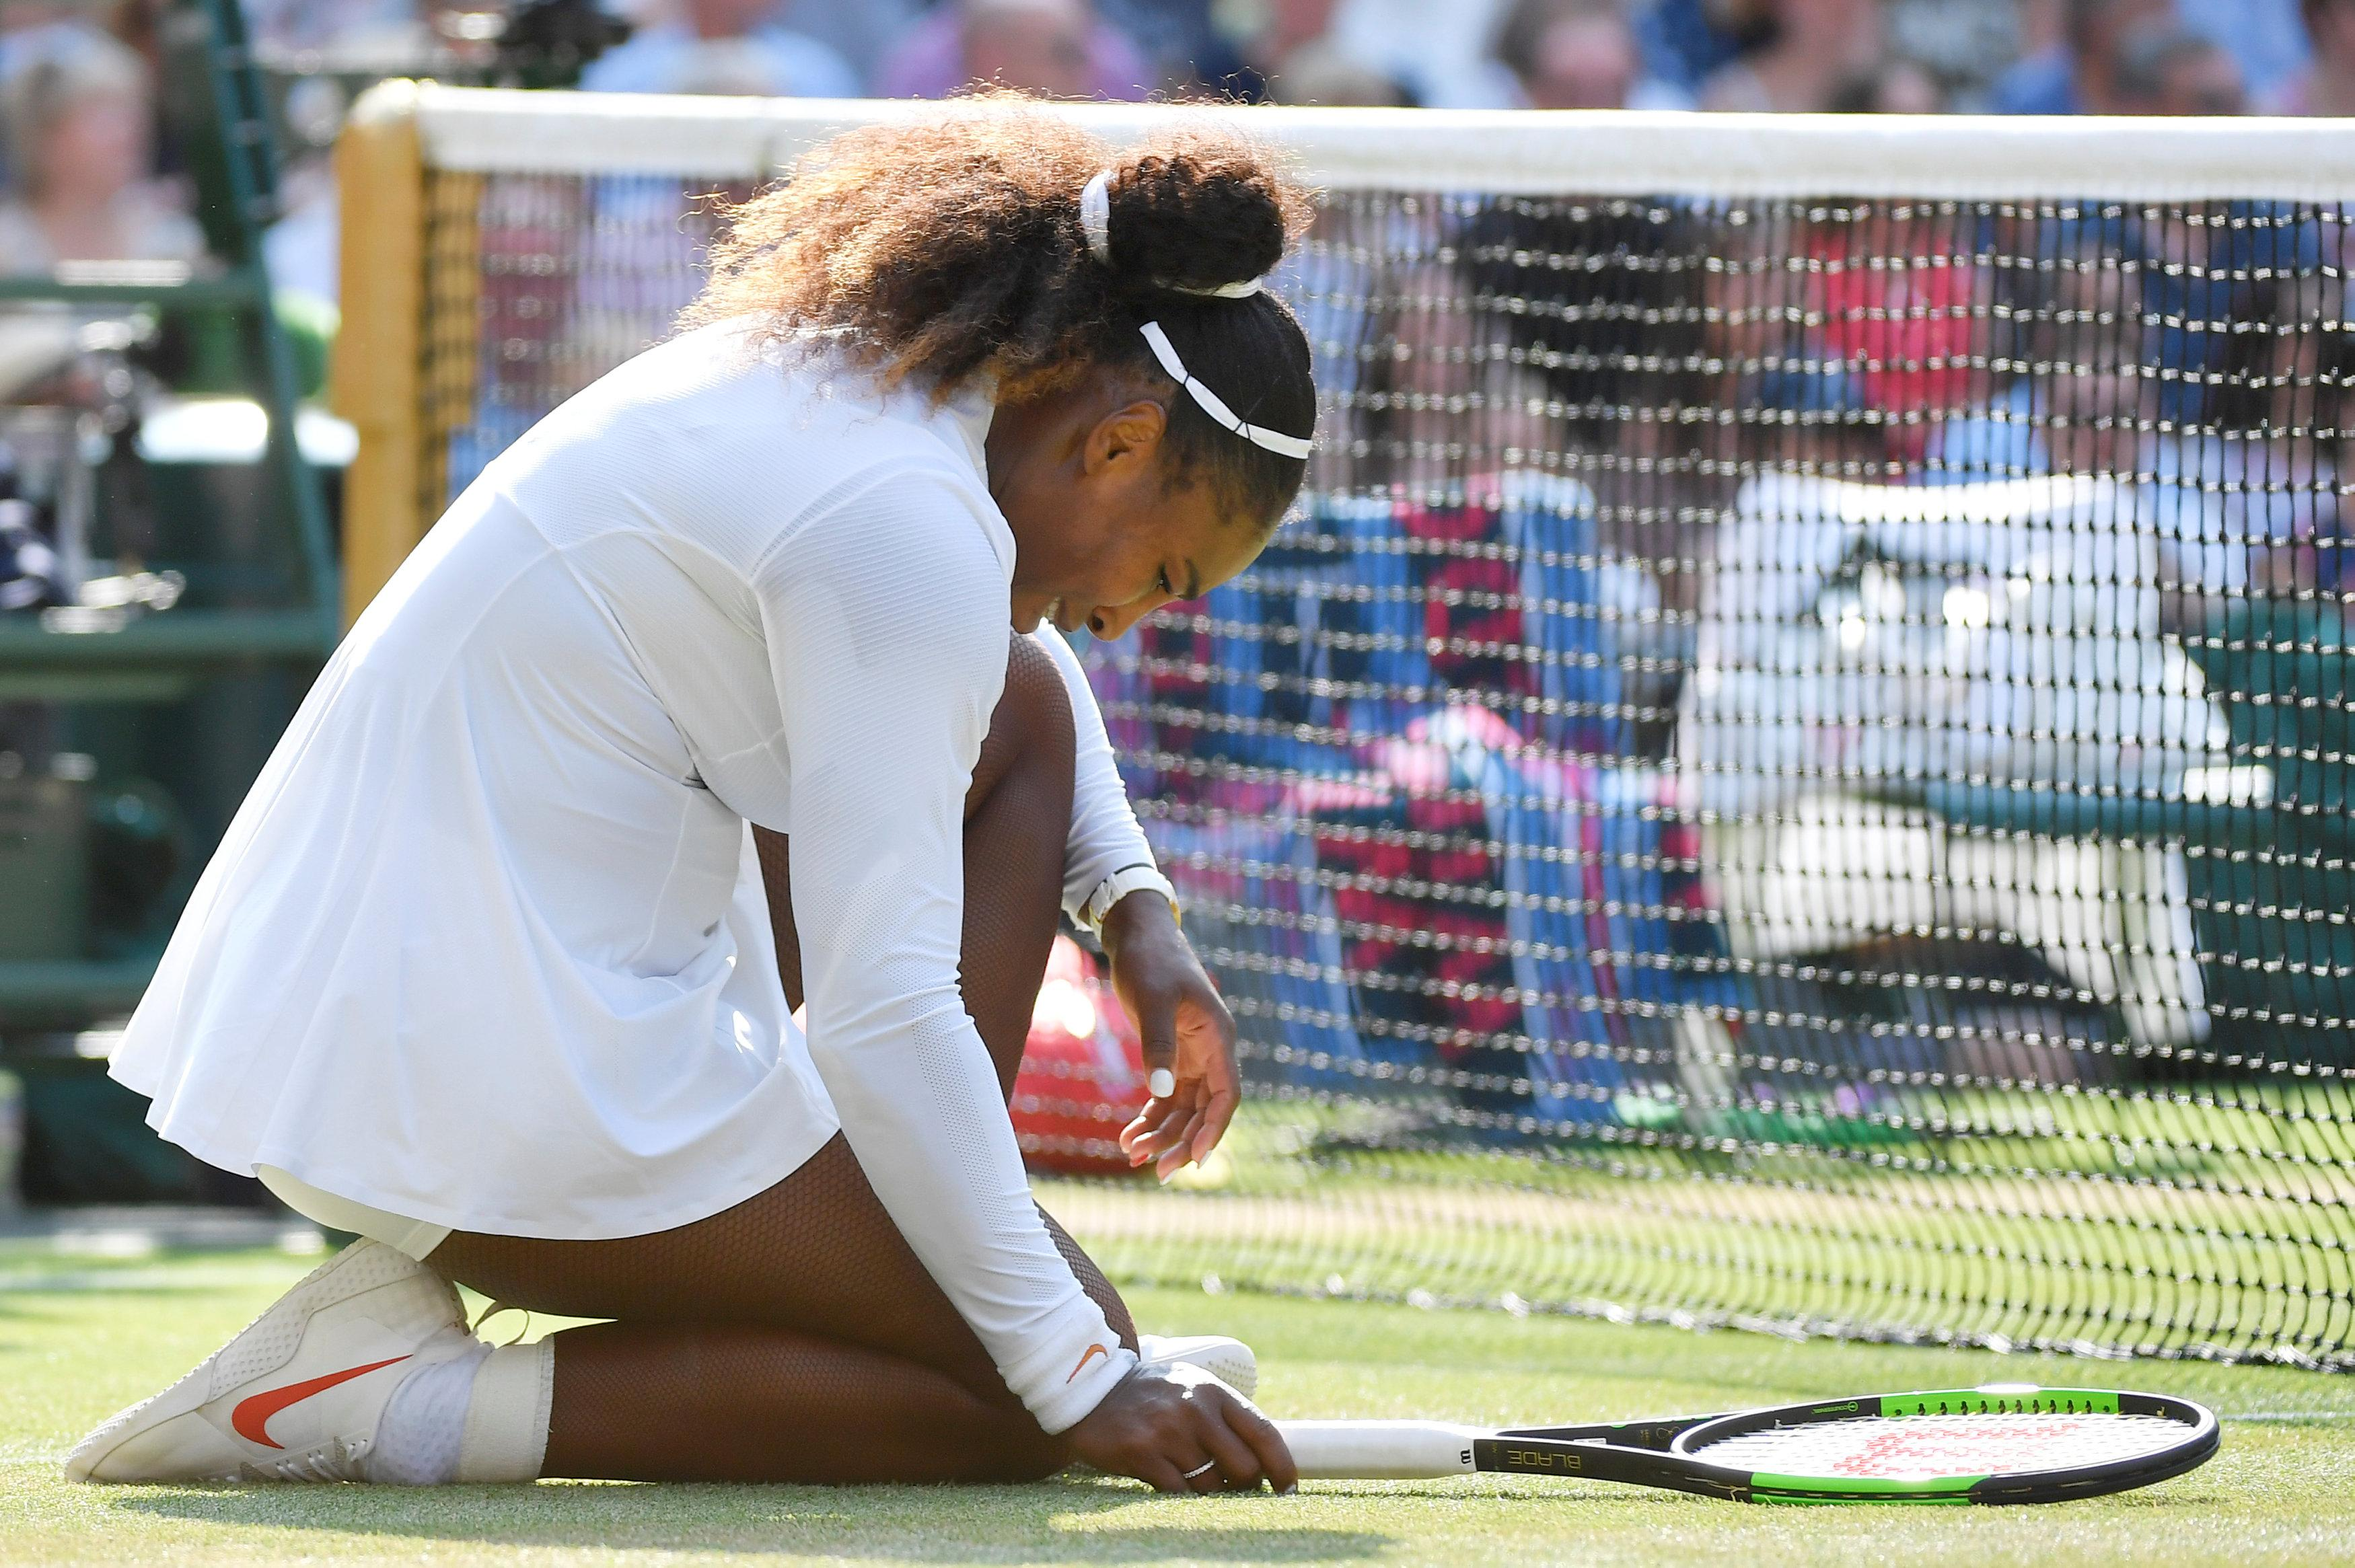 Serena Williams battled so hard all fortnight but fell short on final day